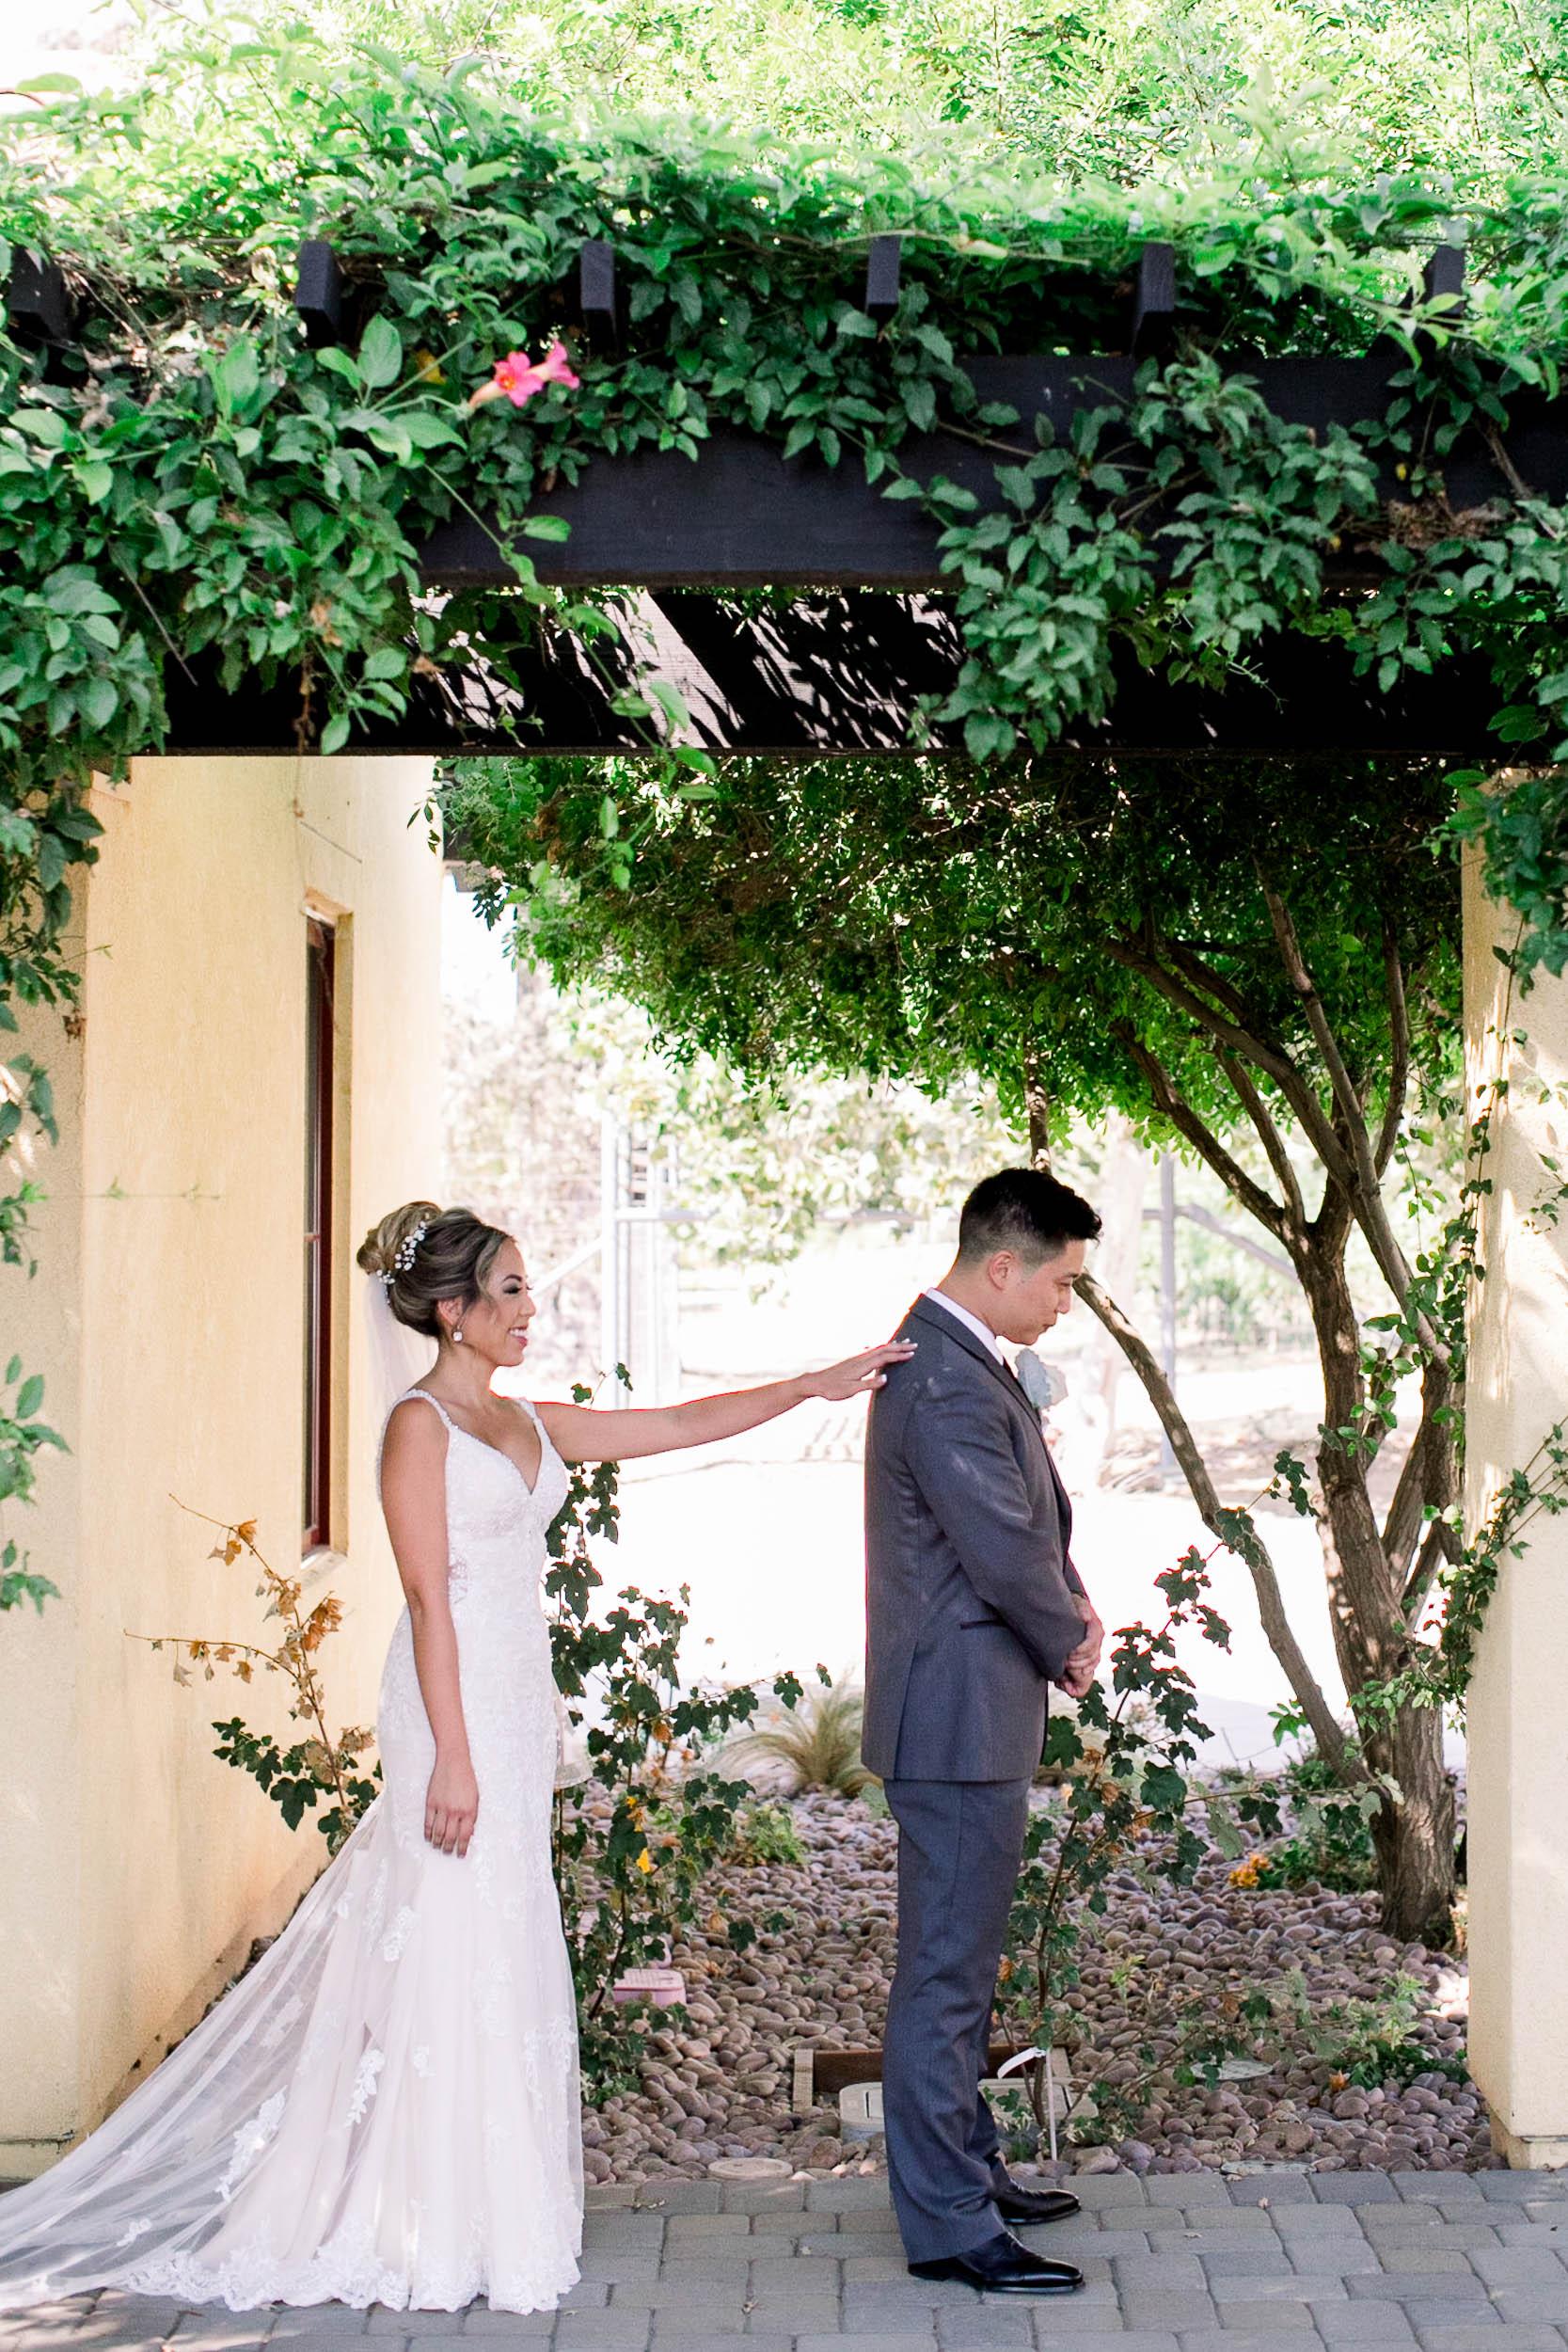 Las Positas Wedding_Buena Lane Photography_090118ER89.jpg